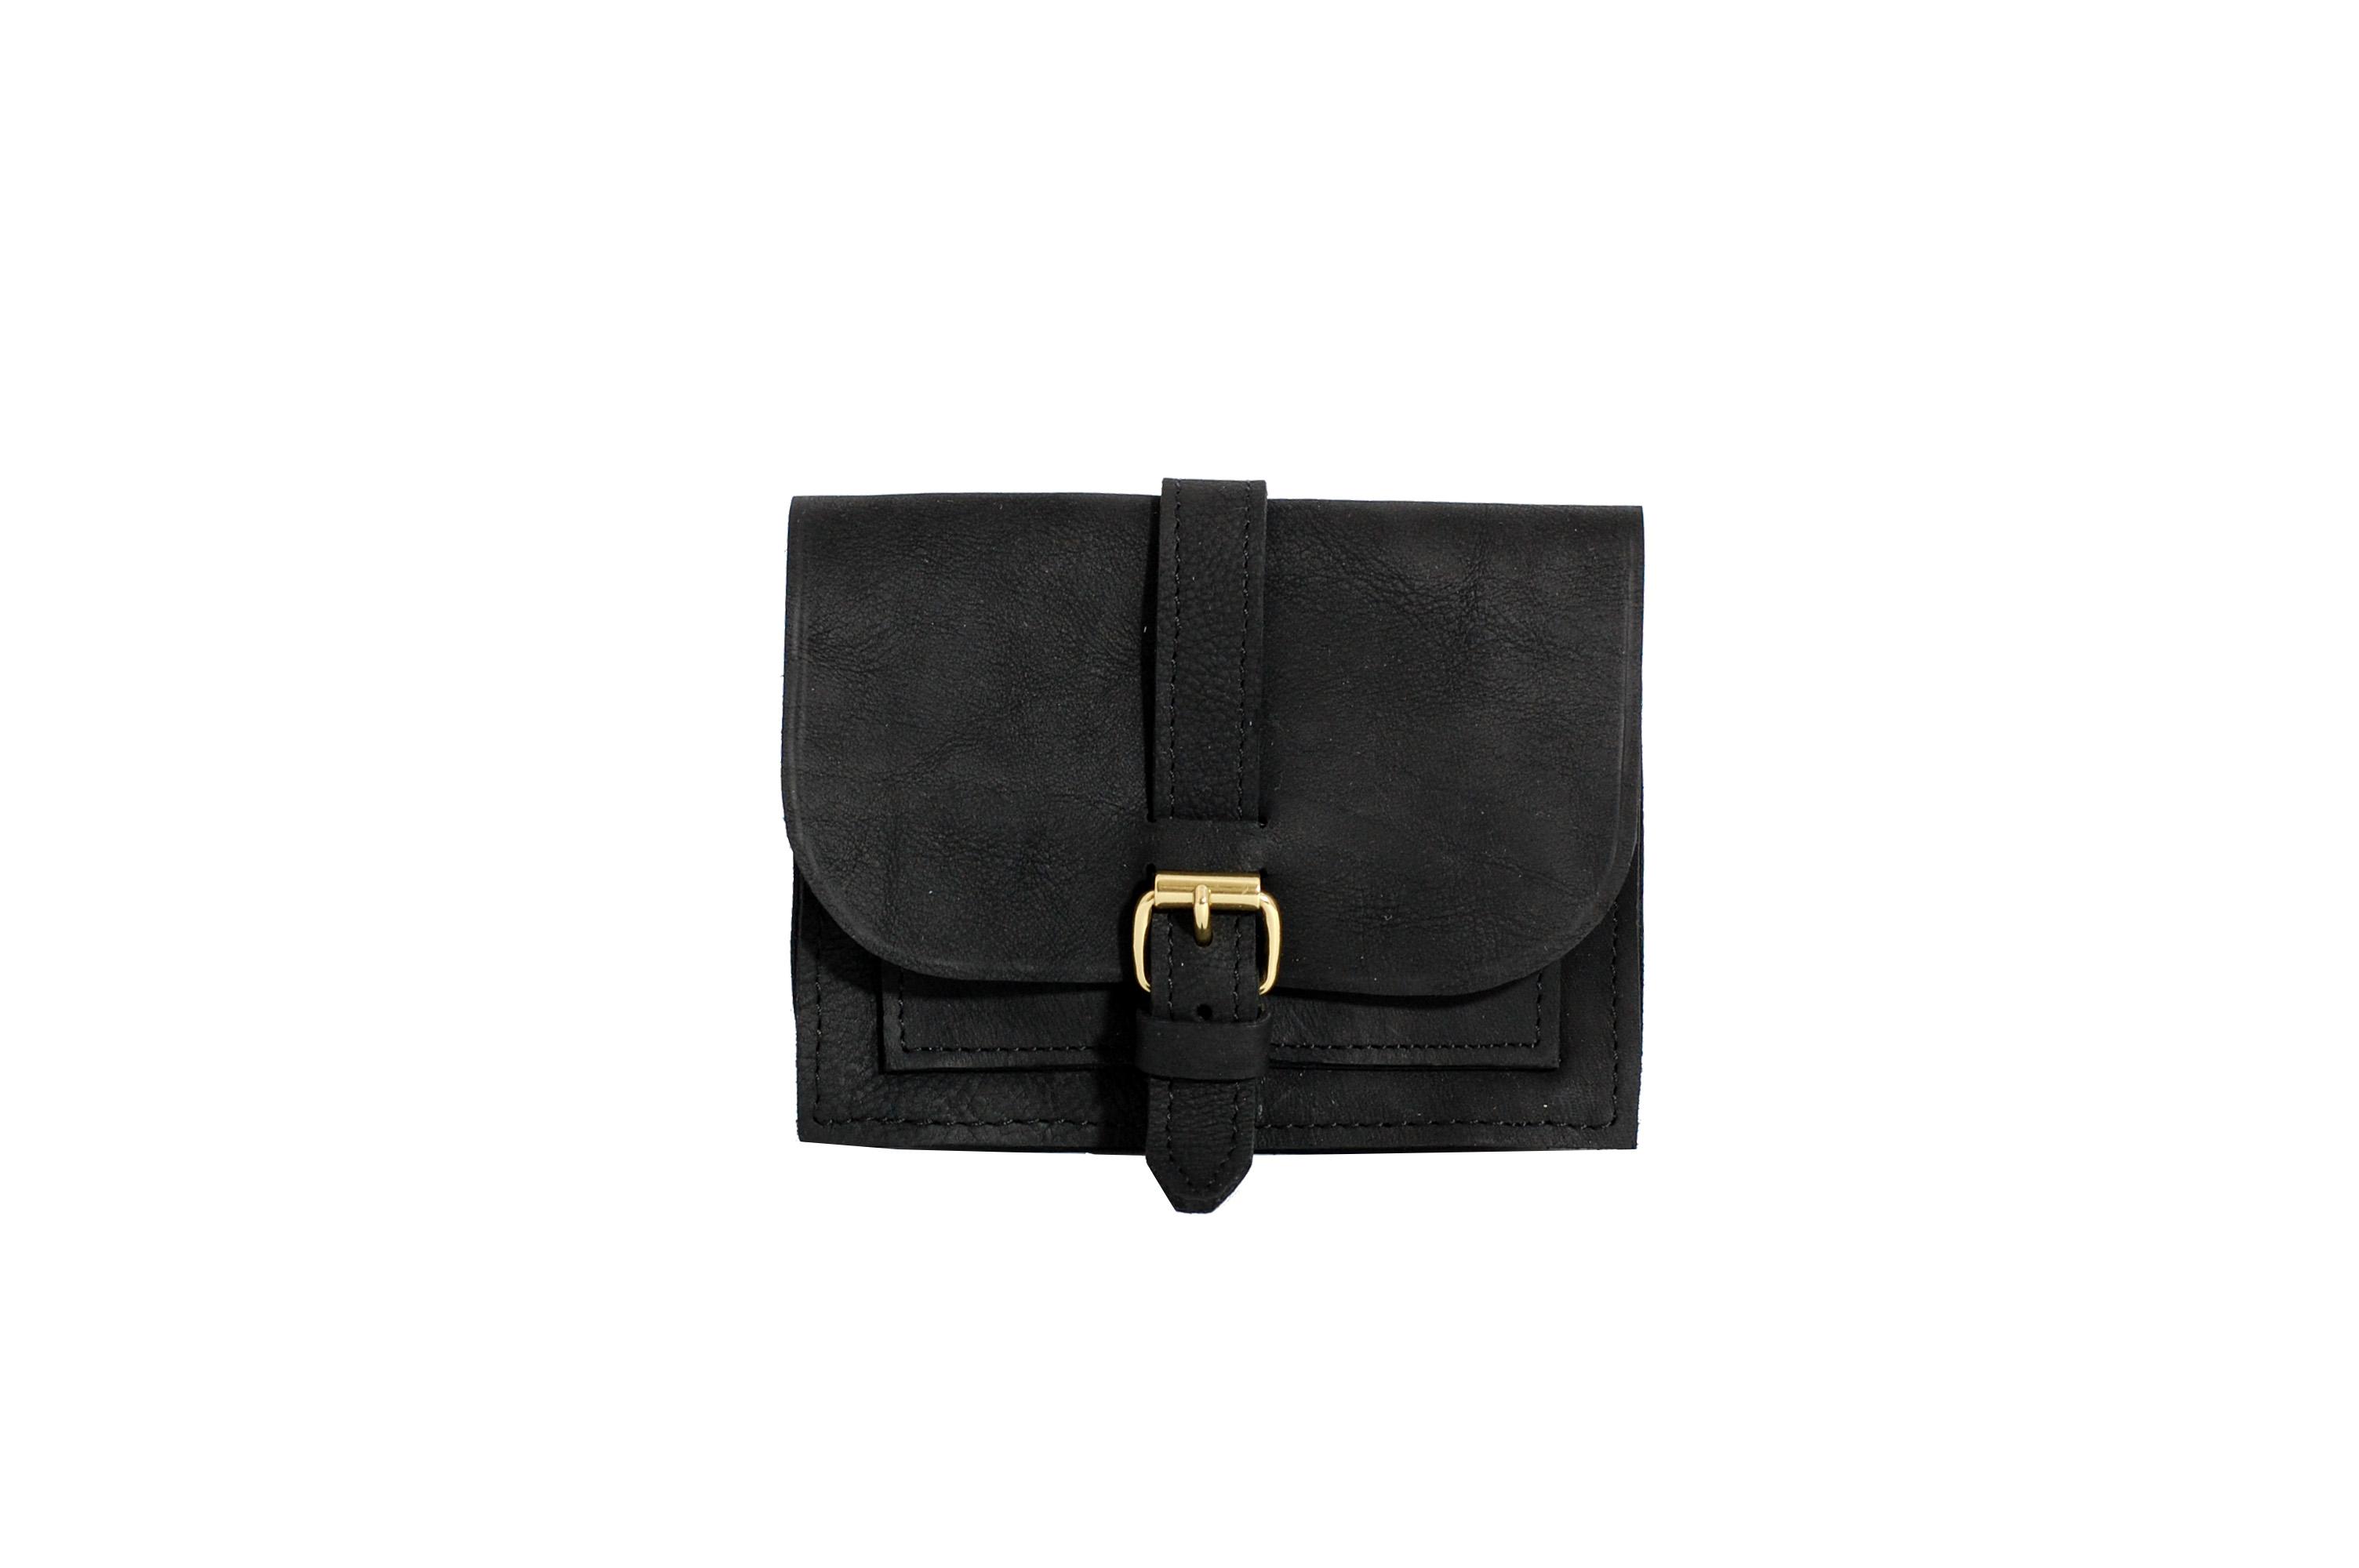 Mahiout monty belt bag garrison belt fanny pack transformable